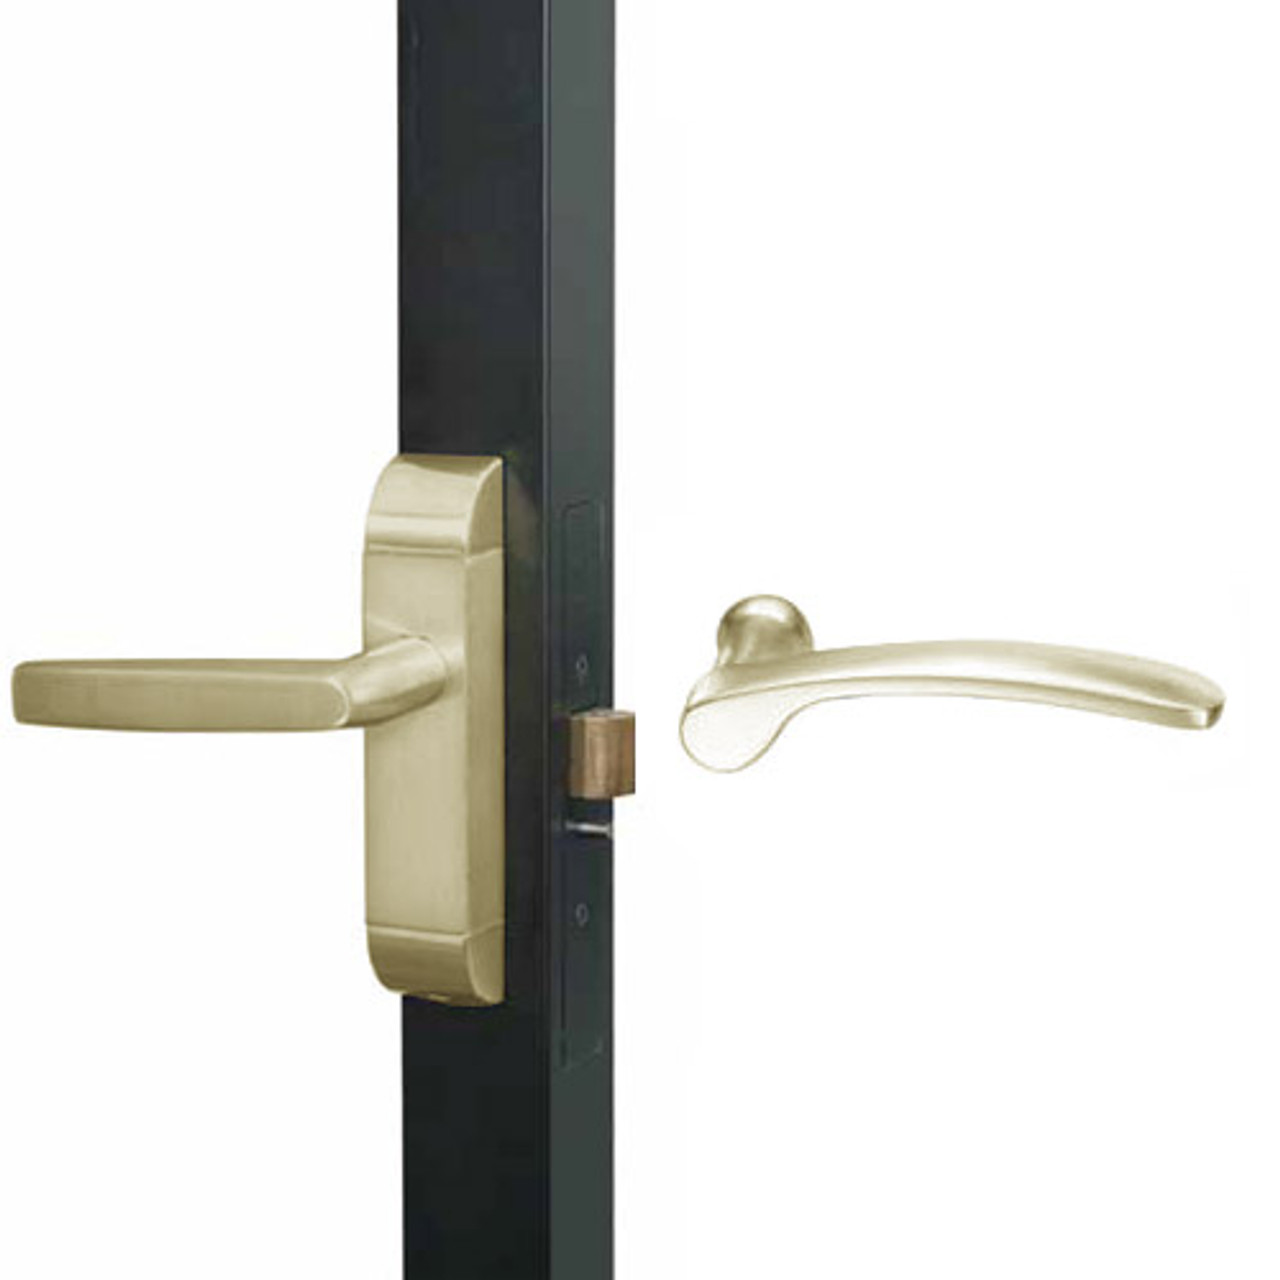 4600-MN-612-US4 Adams Rite MN Designer Deadlatch handle in Satin Brass Finish